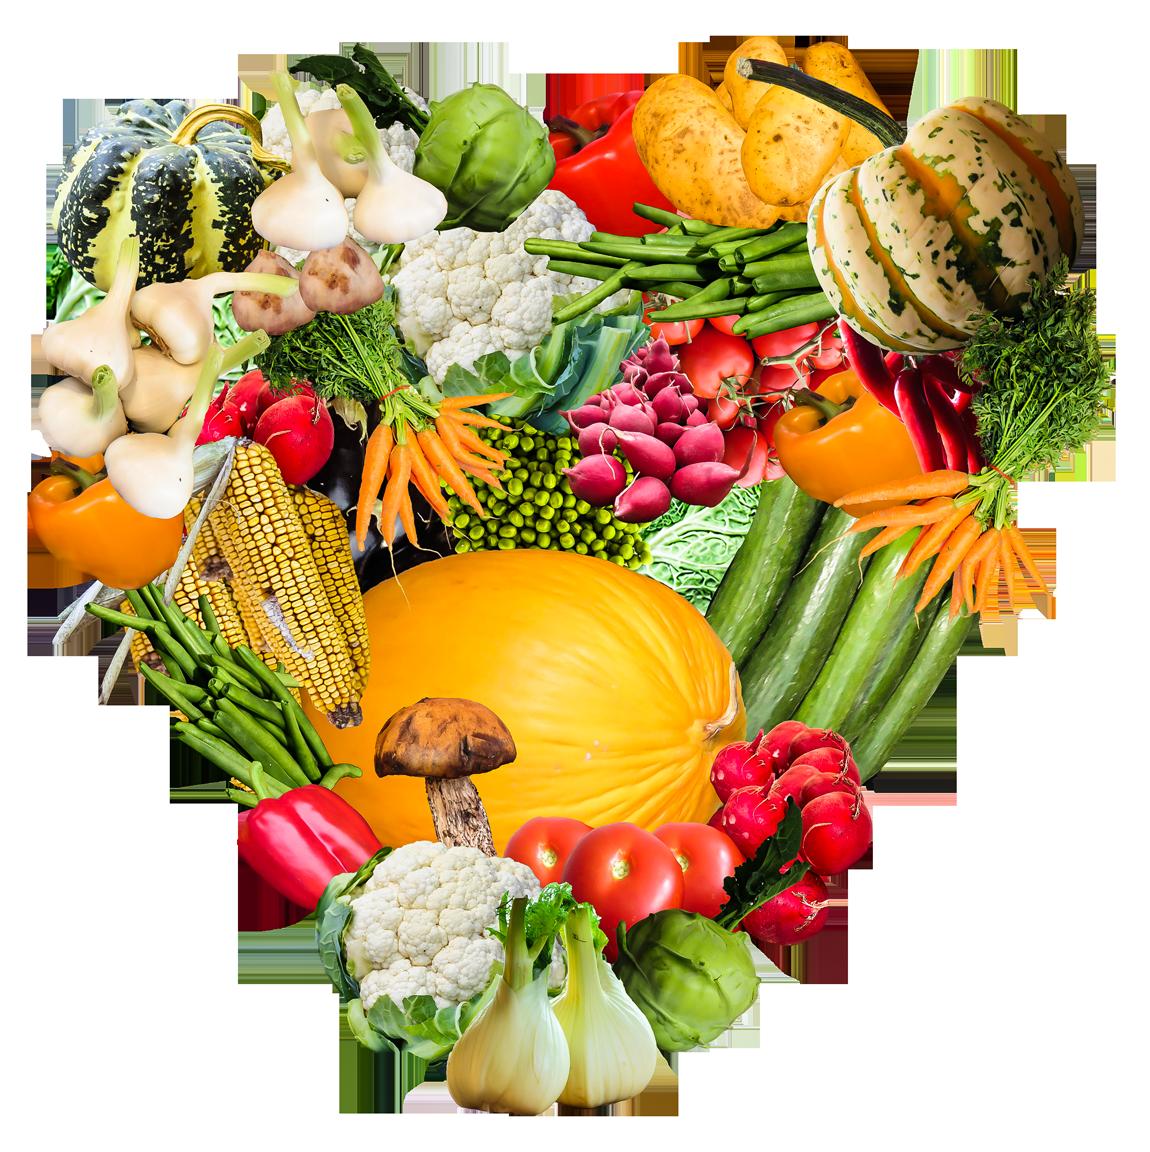 Heart Vegetables Png Image Vegetables Fresh Vegetables White Cups